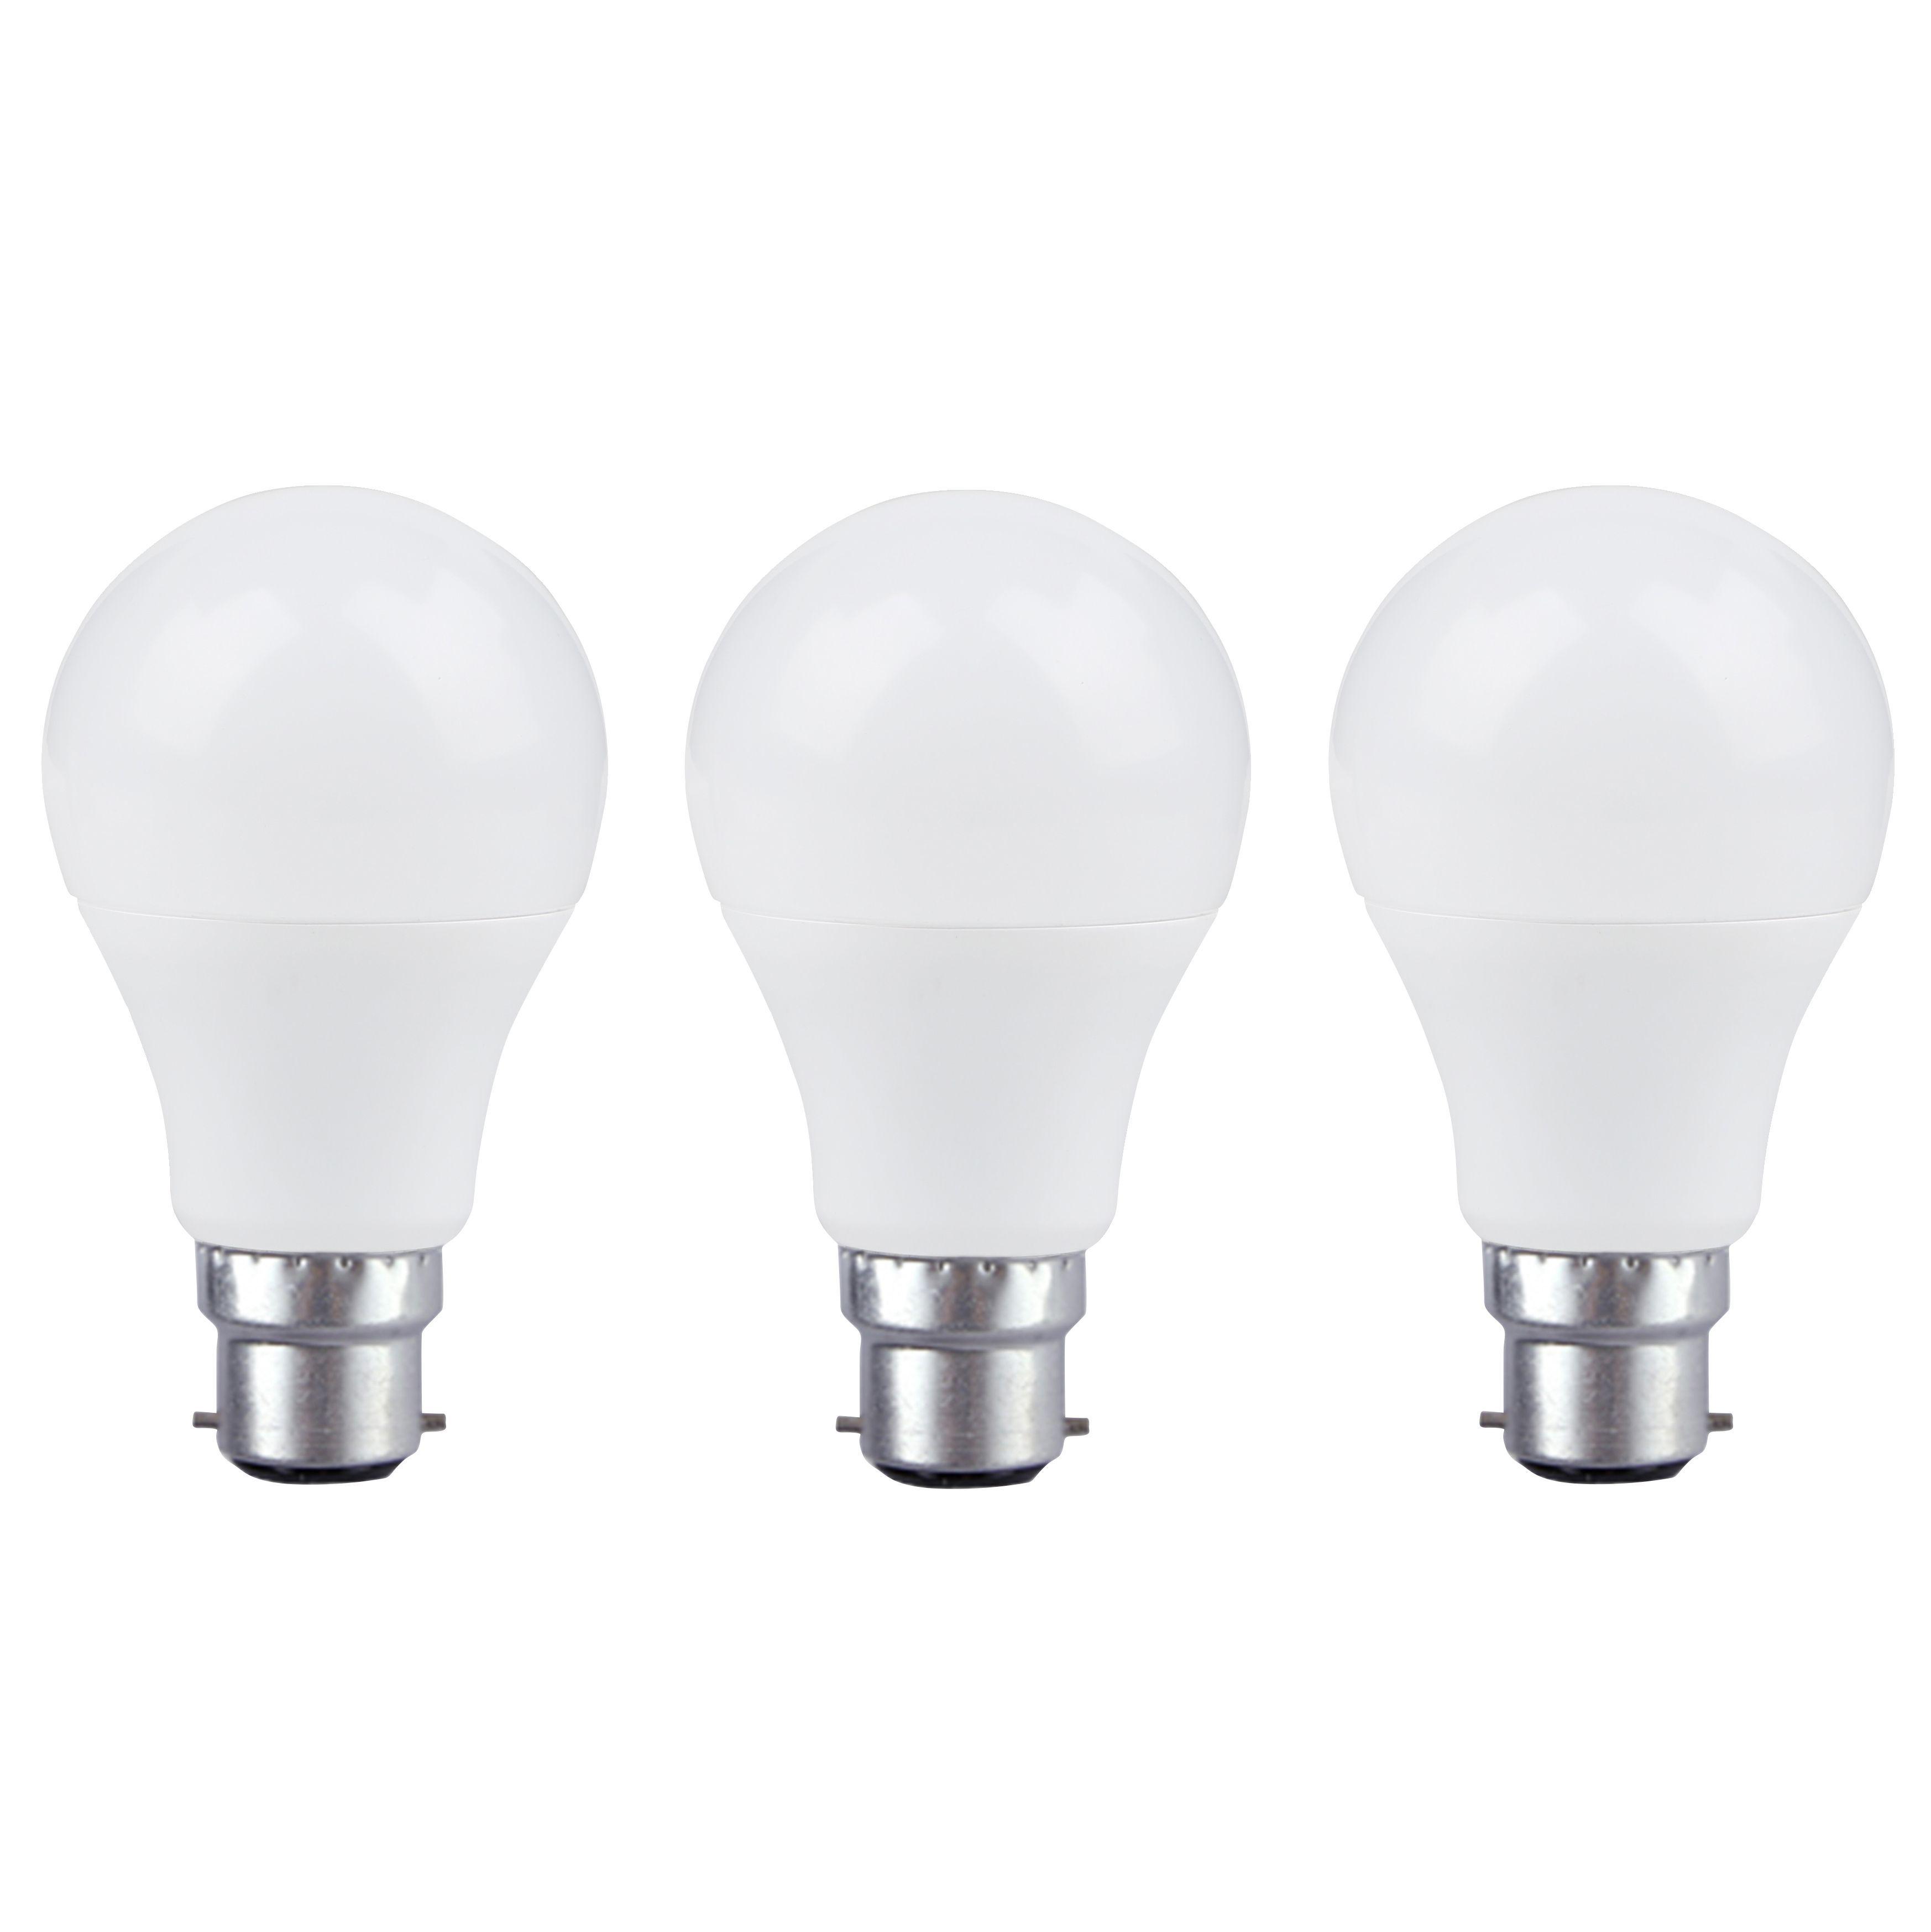 Diall B22 806lm Led Classic Light Bulb, Pack Of 3